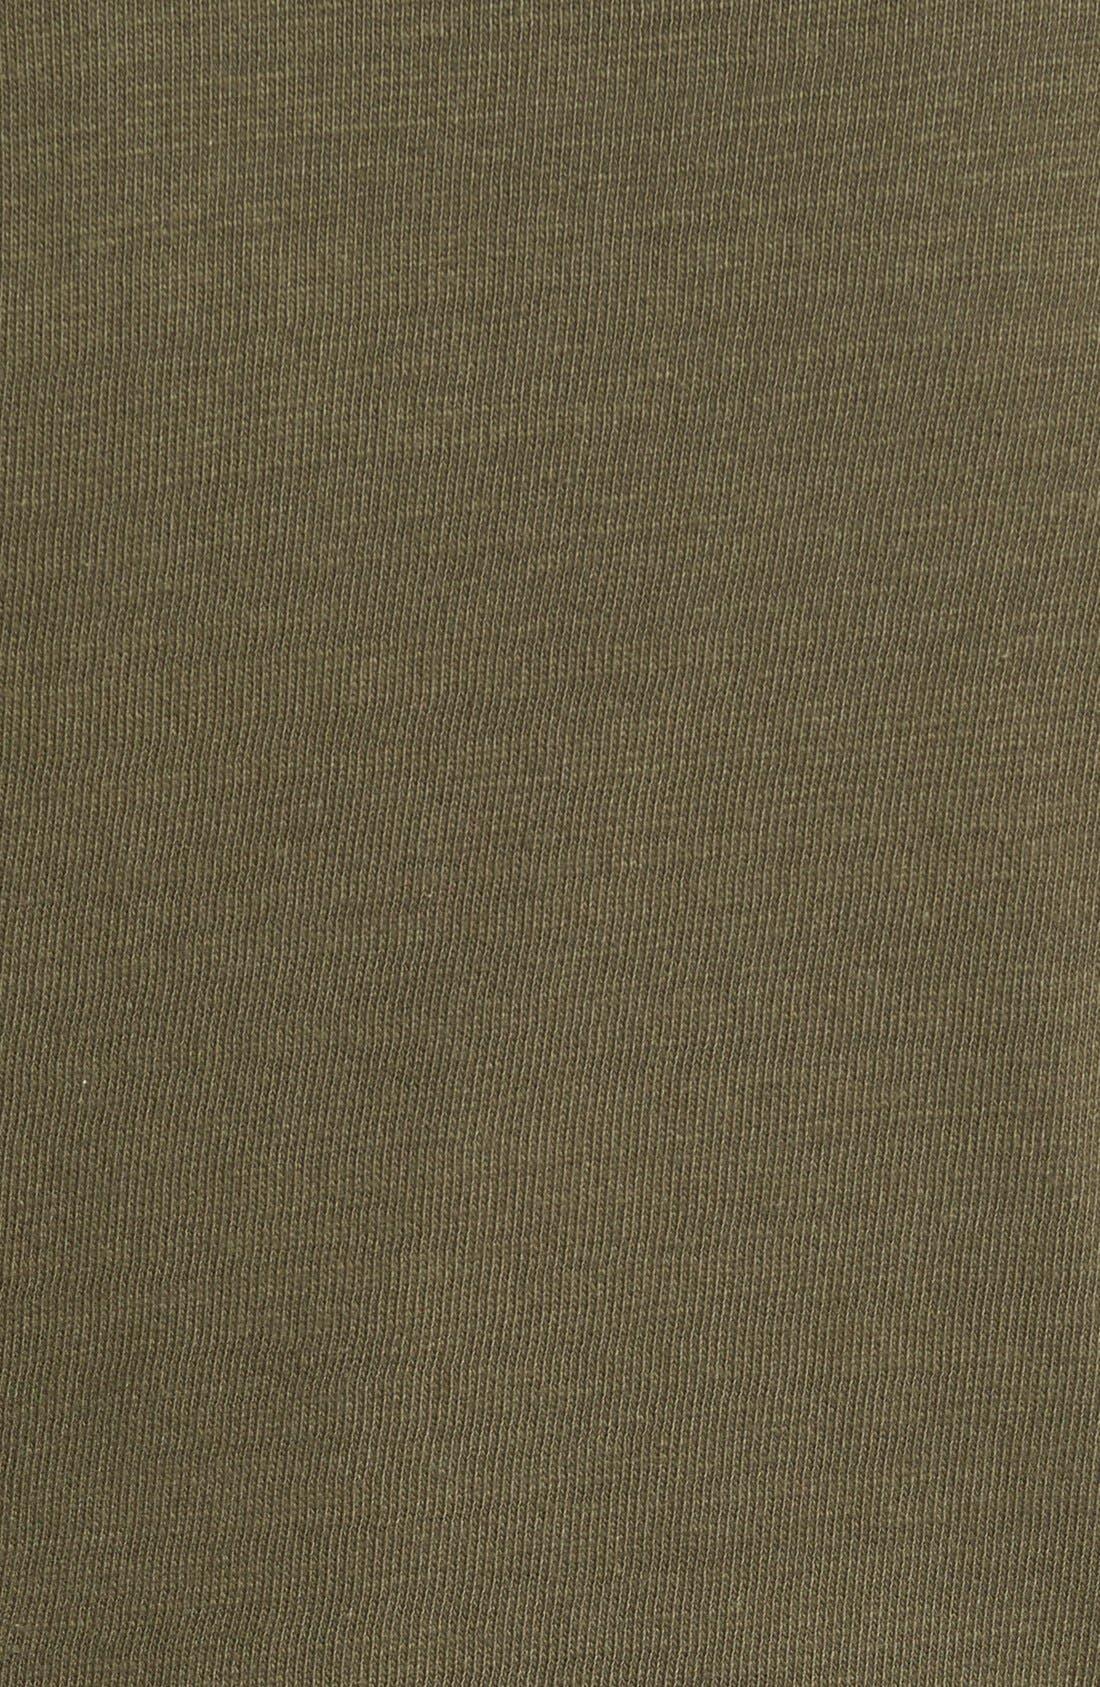 Knit One-Button Blazer,                             Alternate thumbnail 50, color,